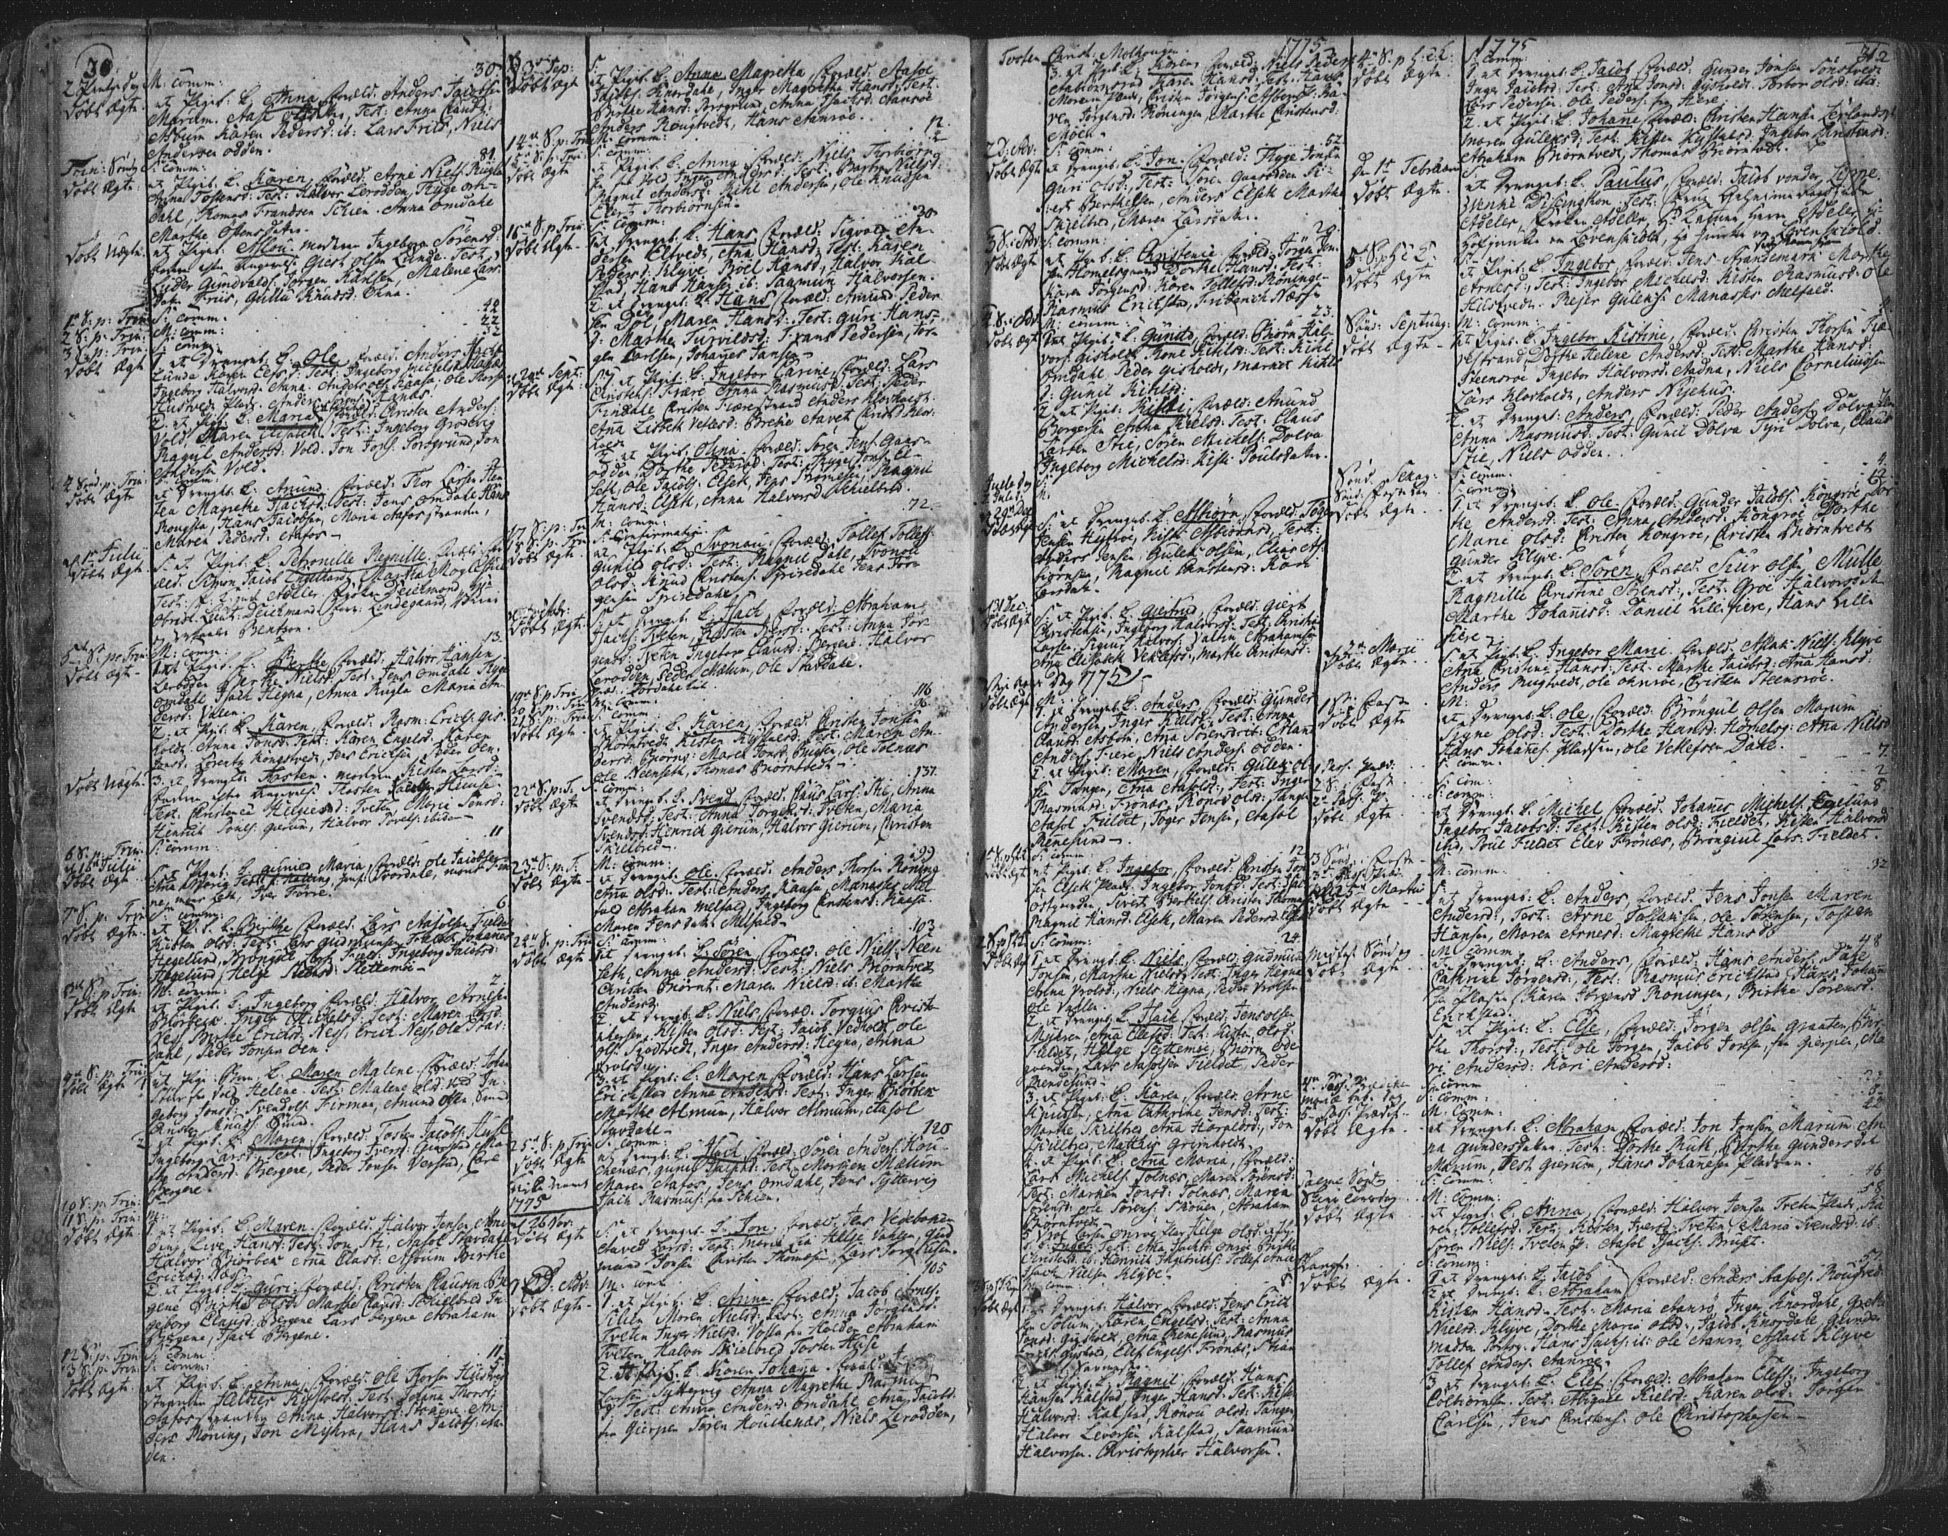 SAKO, Solum kirkebøker, F/Fa/L0003: Ministerialbok nr. I 3, 1761-1814, s. 30-31